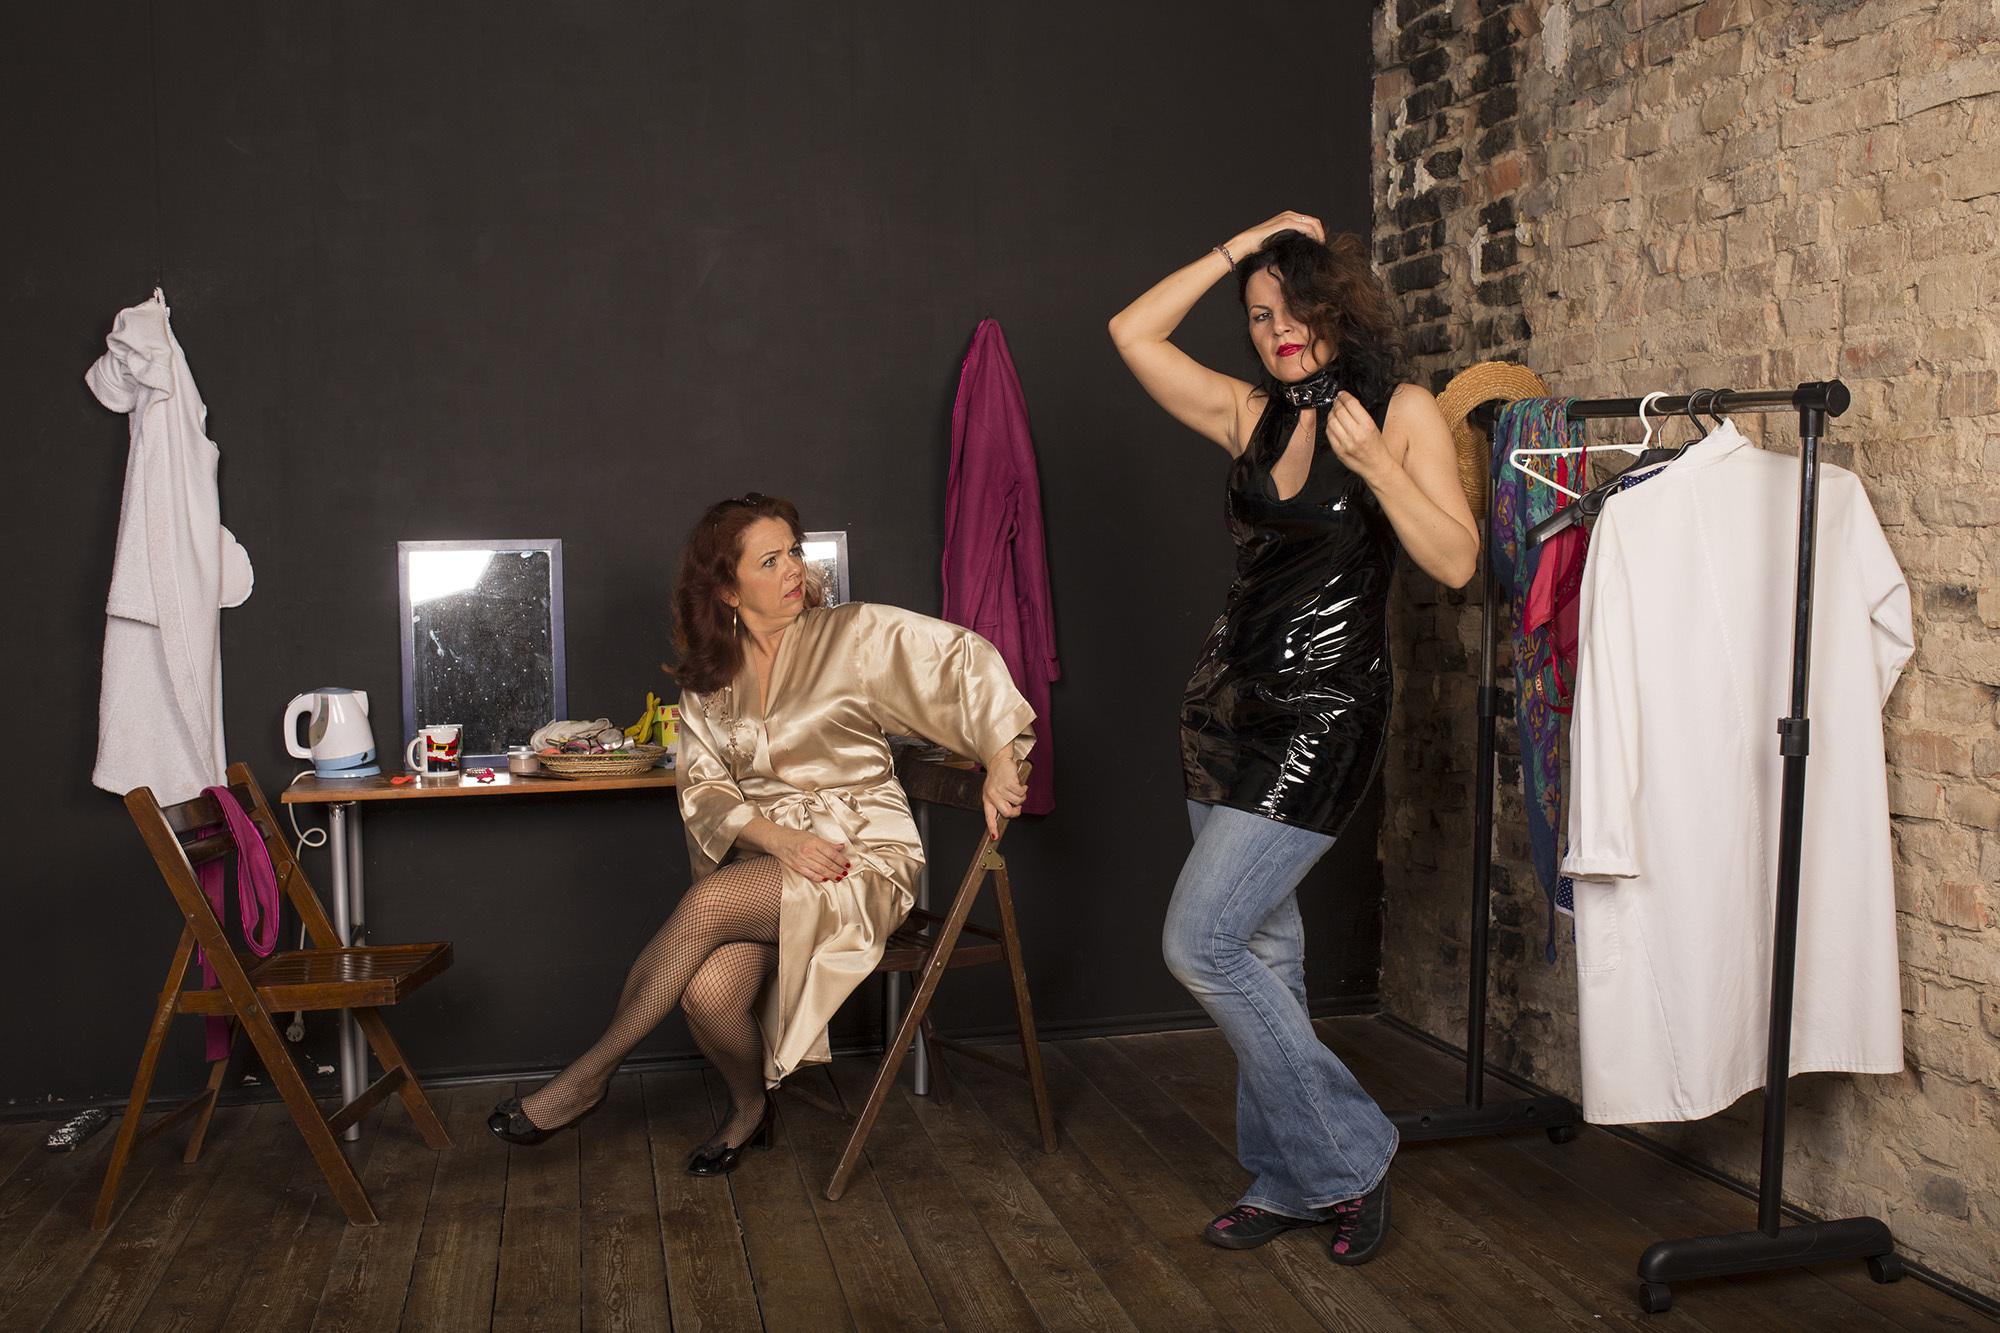 Aktorka randki ze starszą aktorką